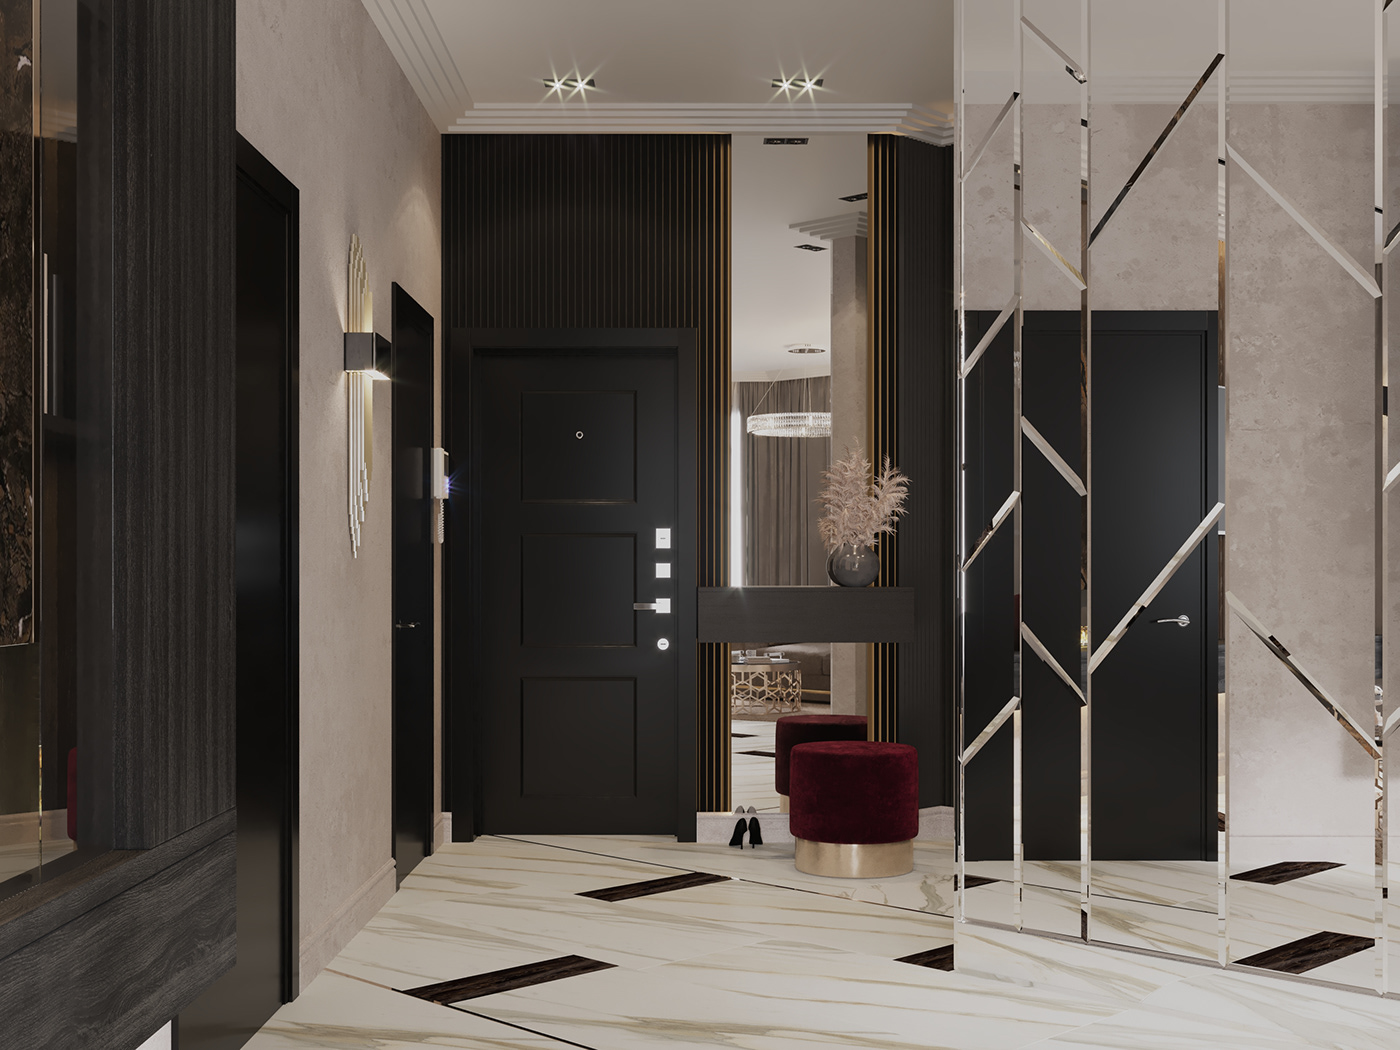 Image may contain: door, wall and interior